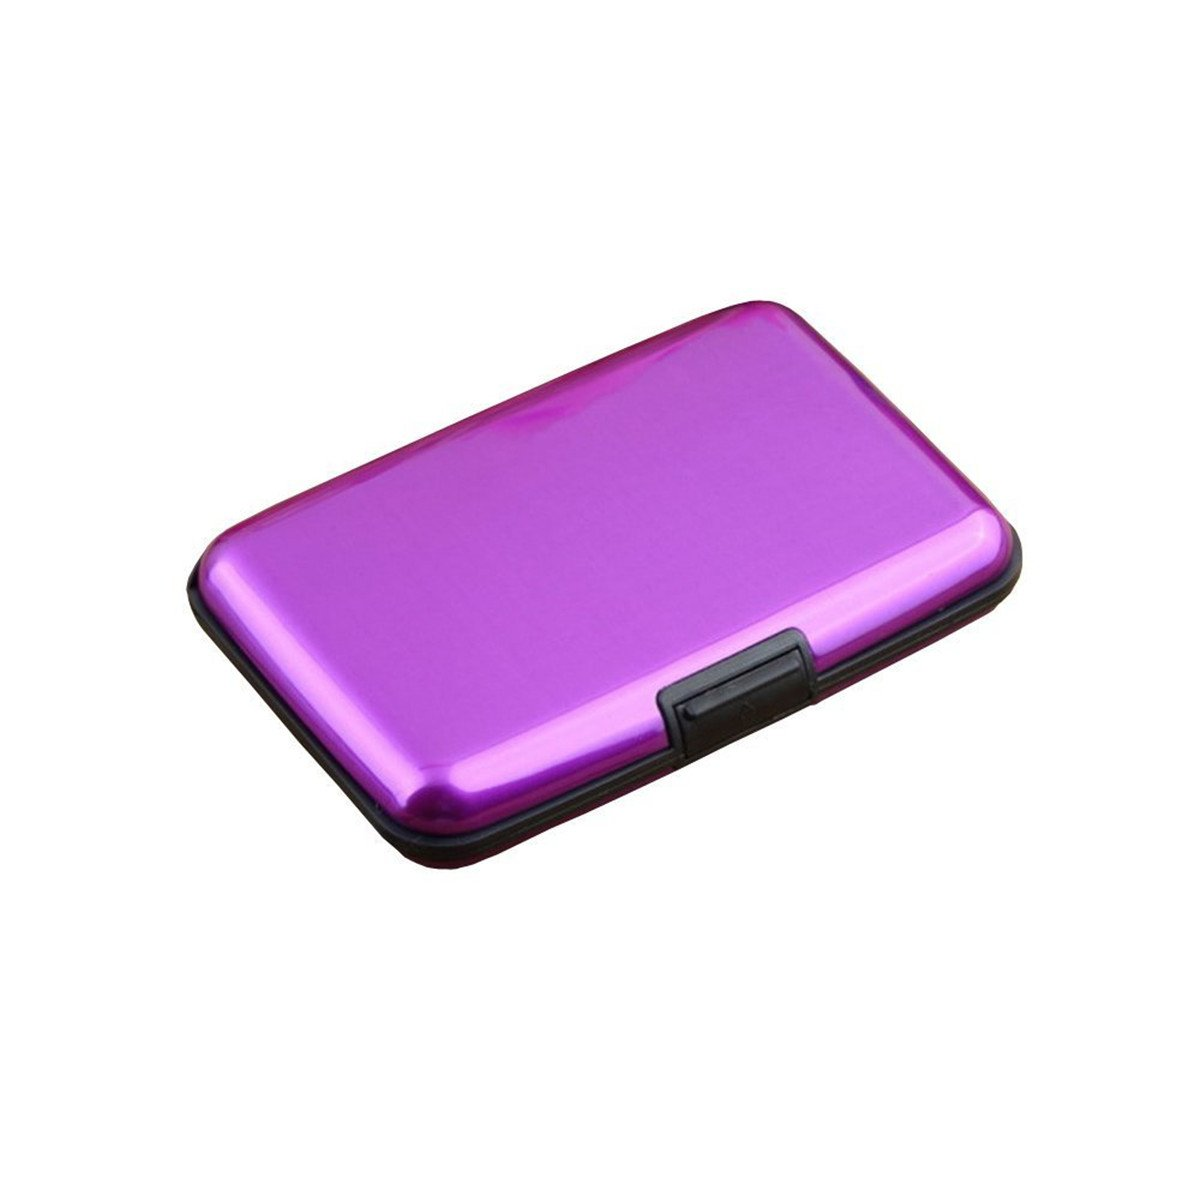 Queenbox Aluminium Metall Wasserdichte Kartenhalter RFID Anti Scan Kreditkarten Debit ID Kartenhalter Fall Abdeckung